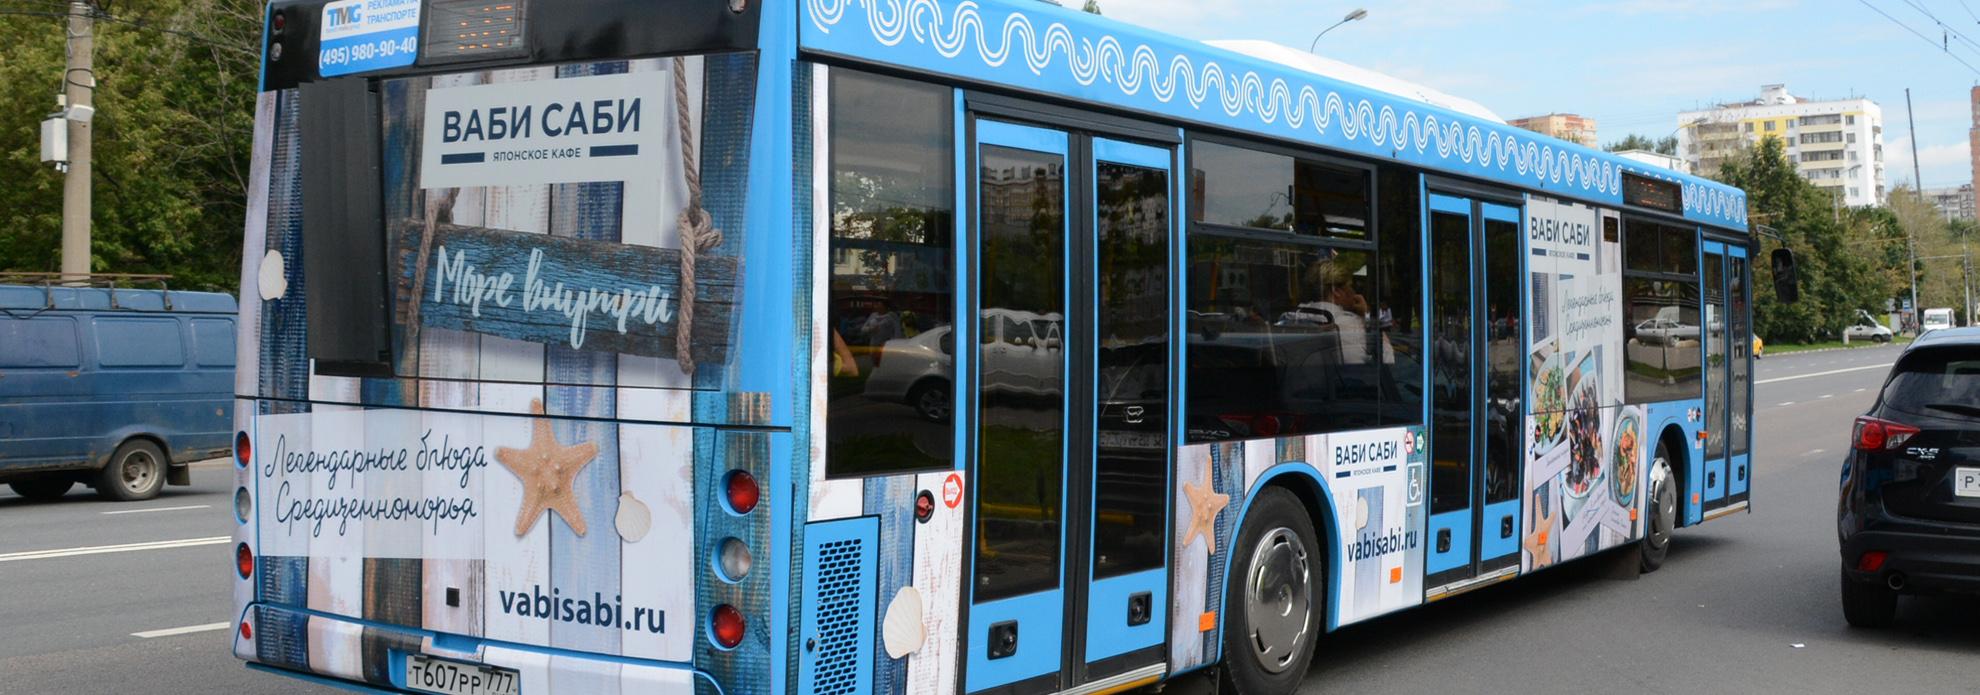 reklama-na-transporte-moskow